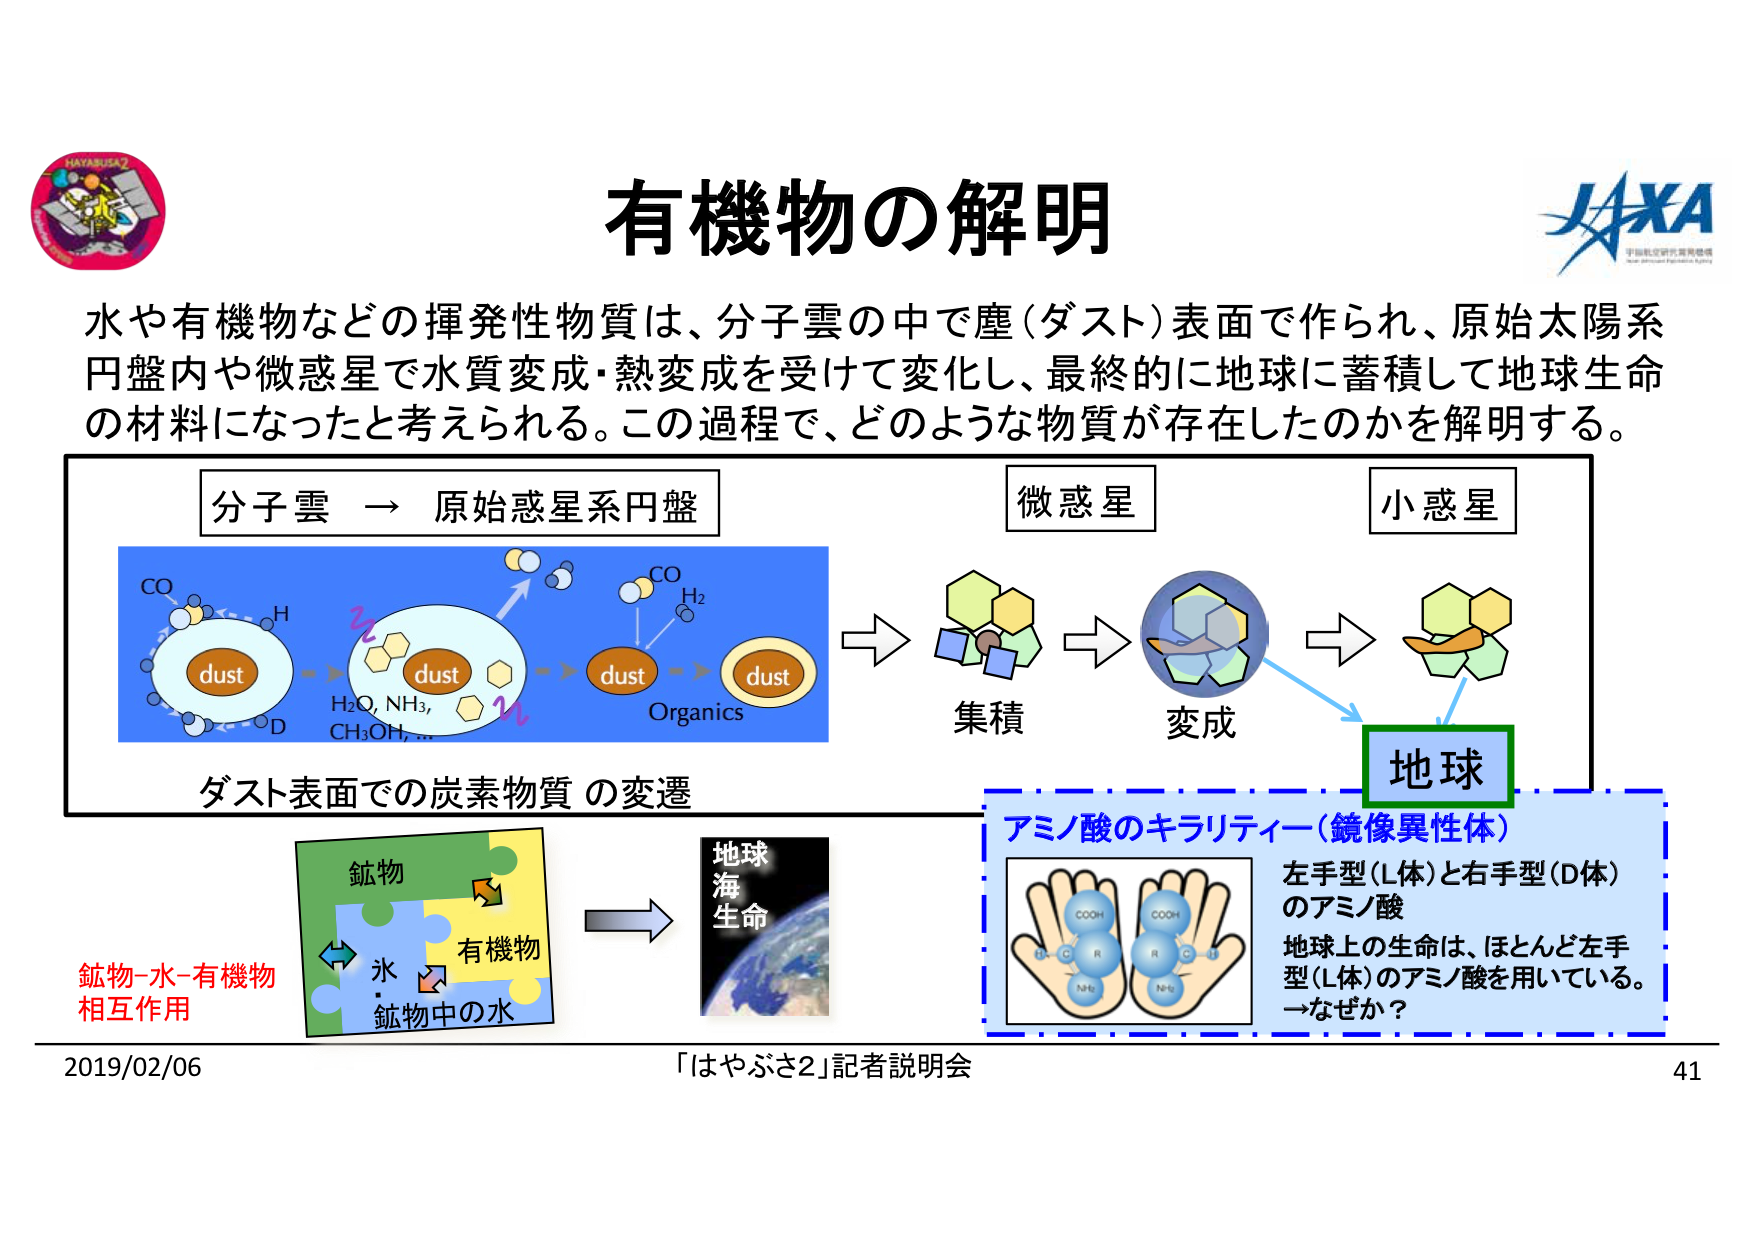 f:id:Imamura:20190204175535p:plain